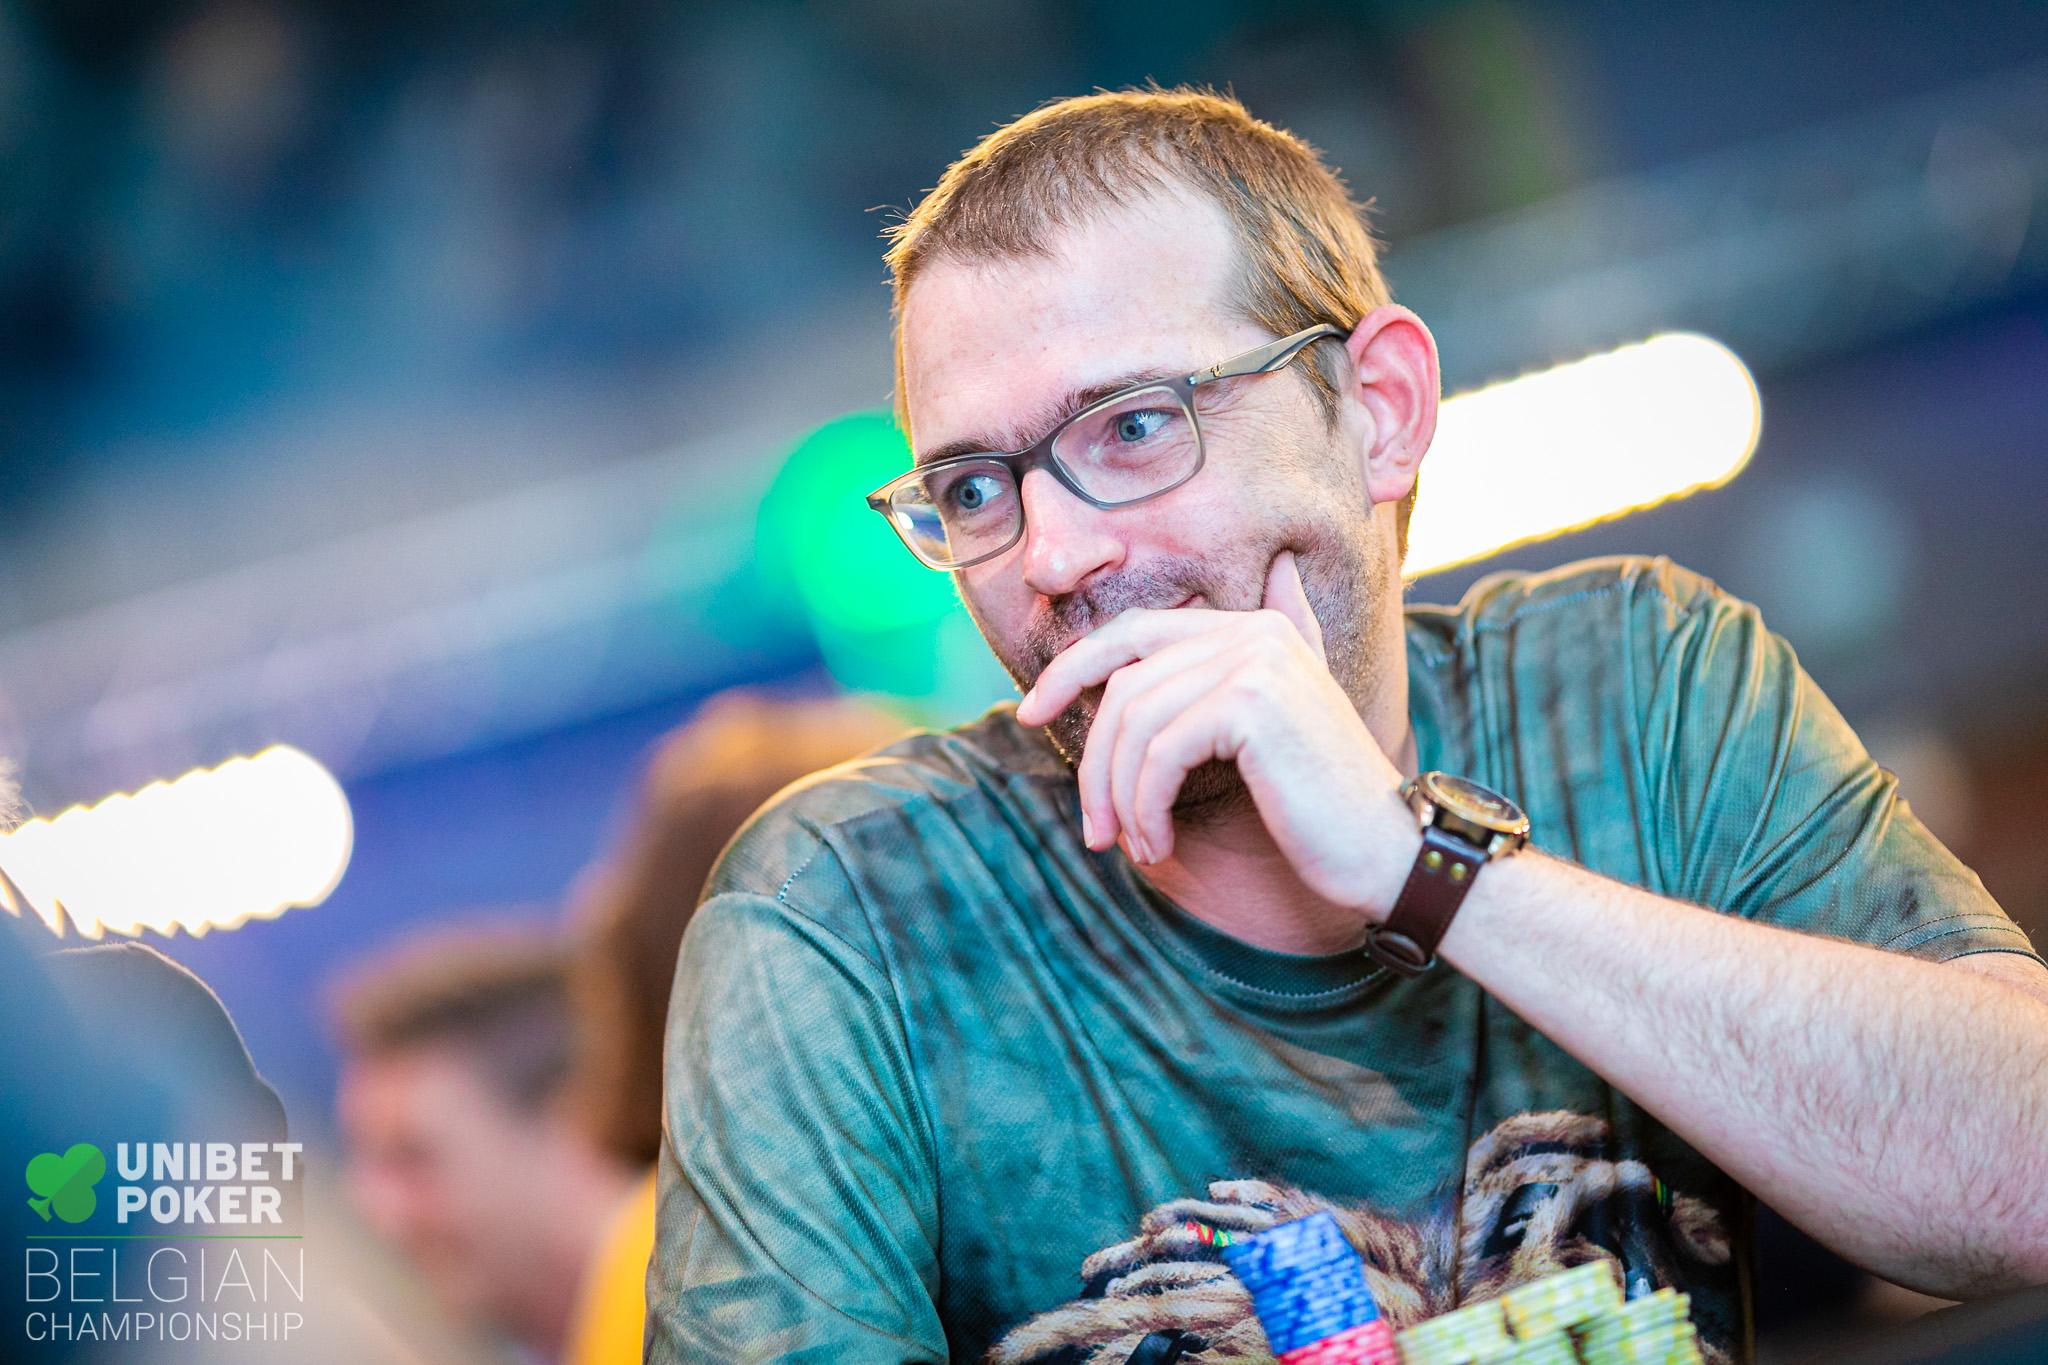 Unibet Poker Belgian Championship 2019 - Main Event (Day 2) 009 William Hens ((C) Tambet Kask 2019)